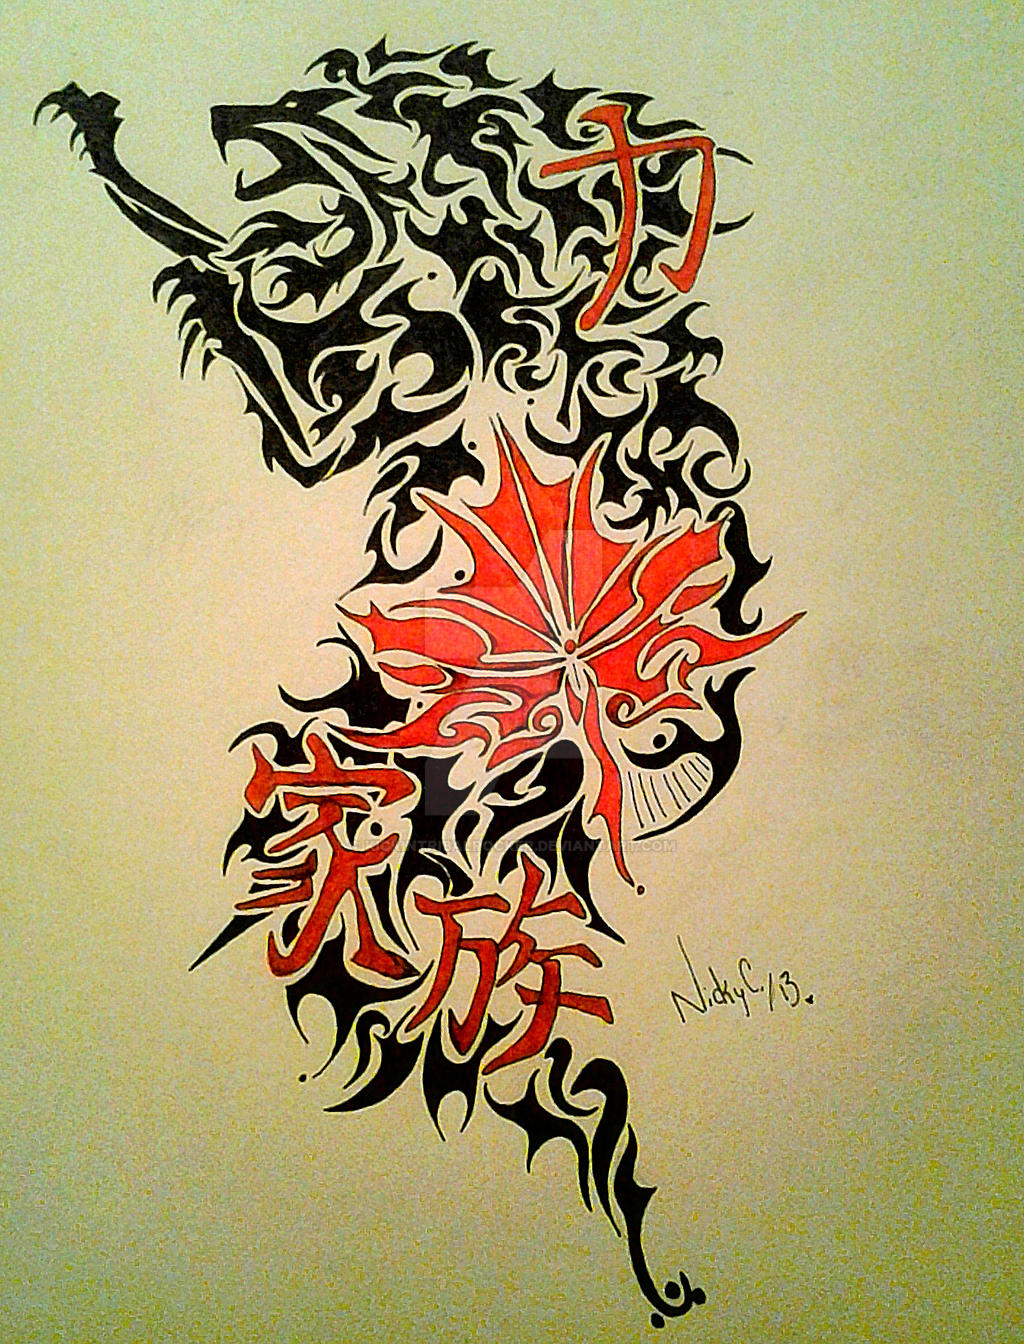 tribal tattoo design request by kickintribalrocker on deviantart. Black Bedroom Furniture Sets. Home Design Ideas